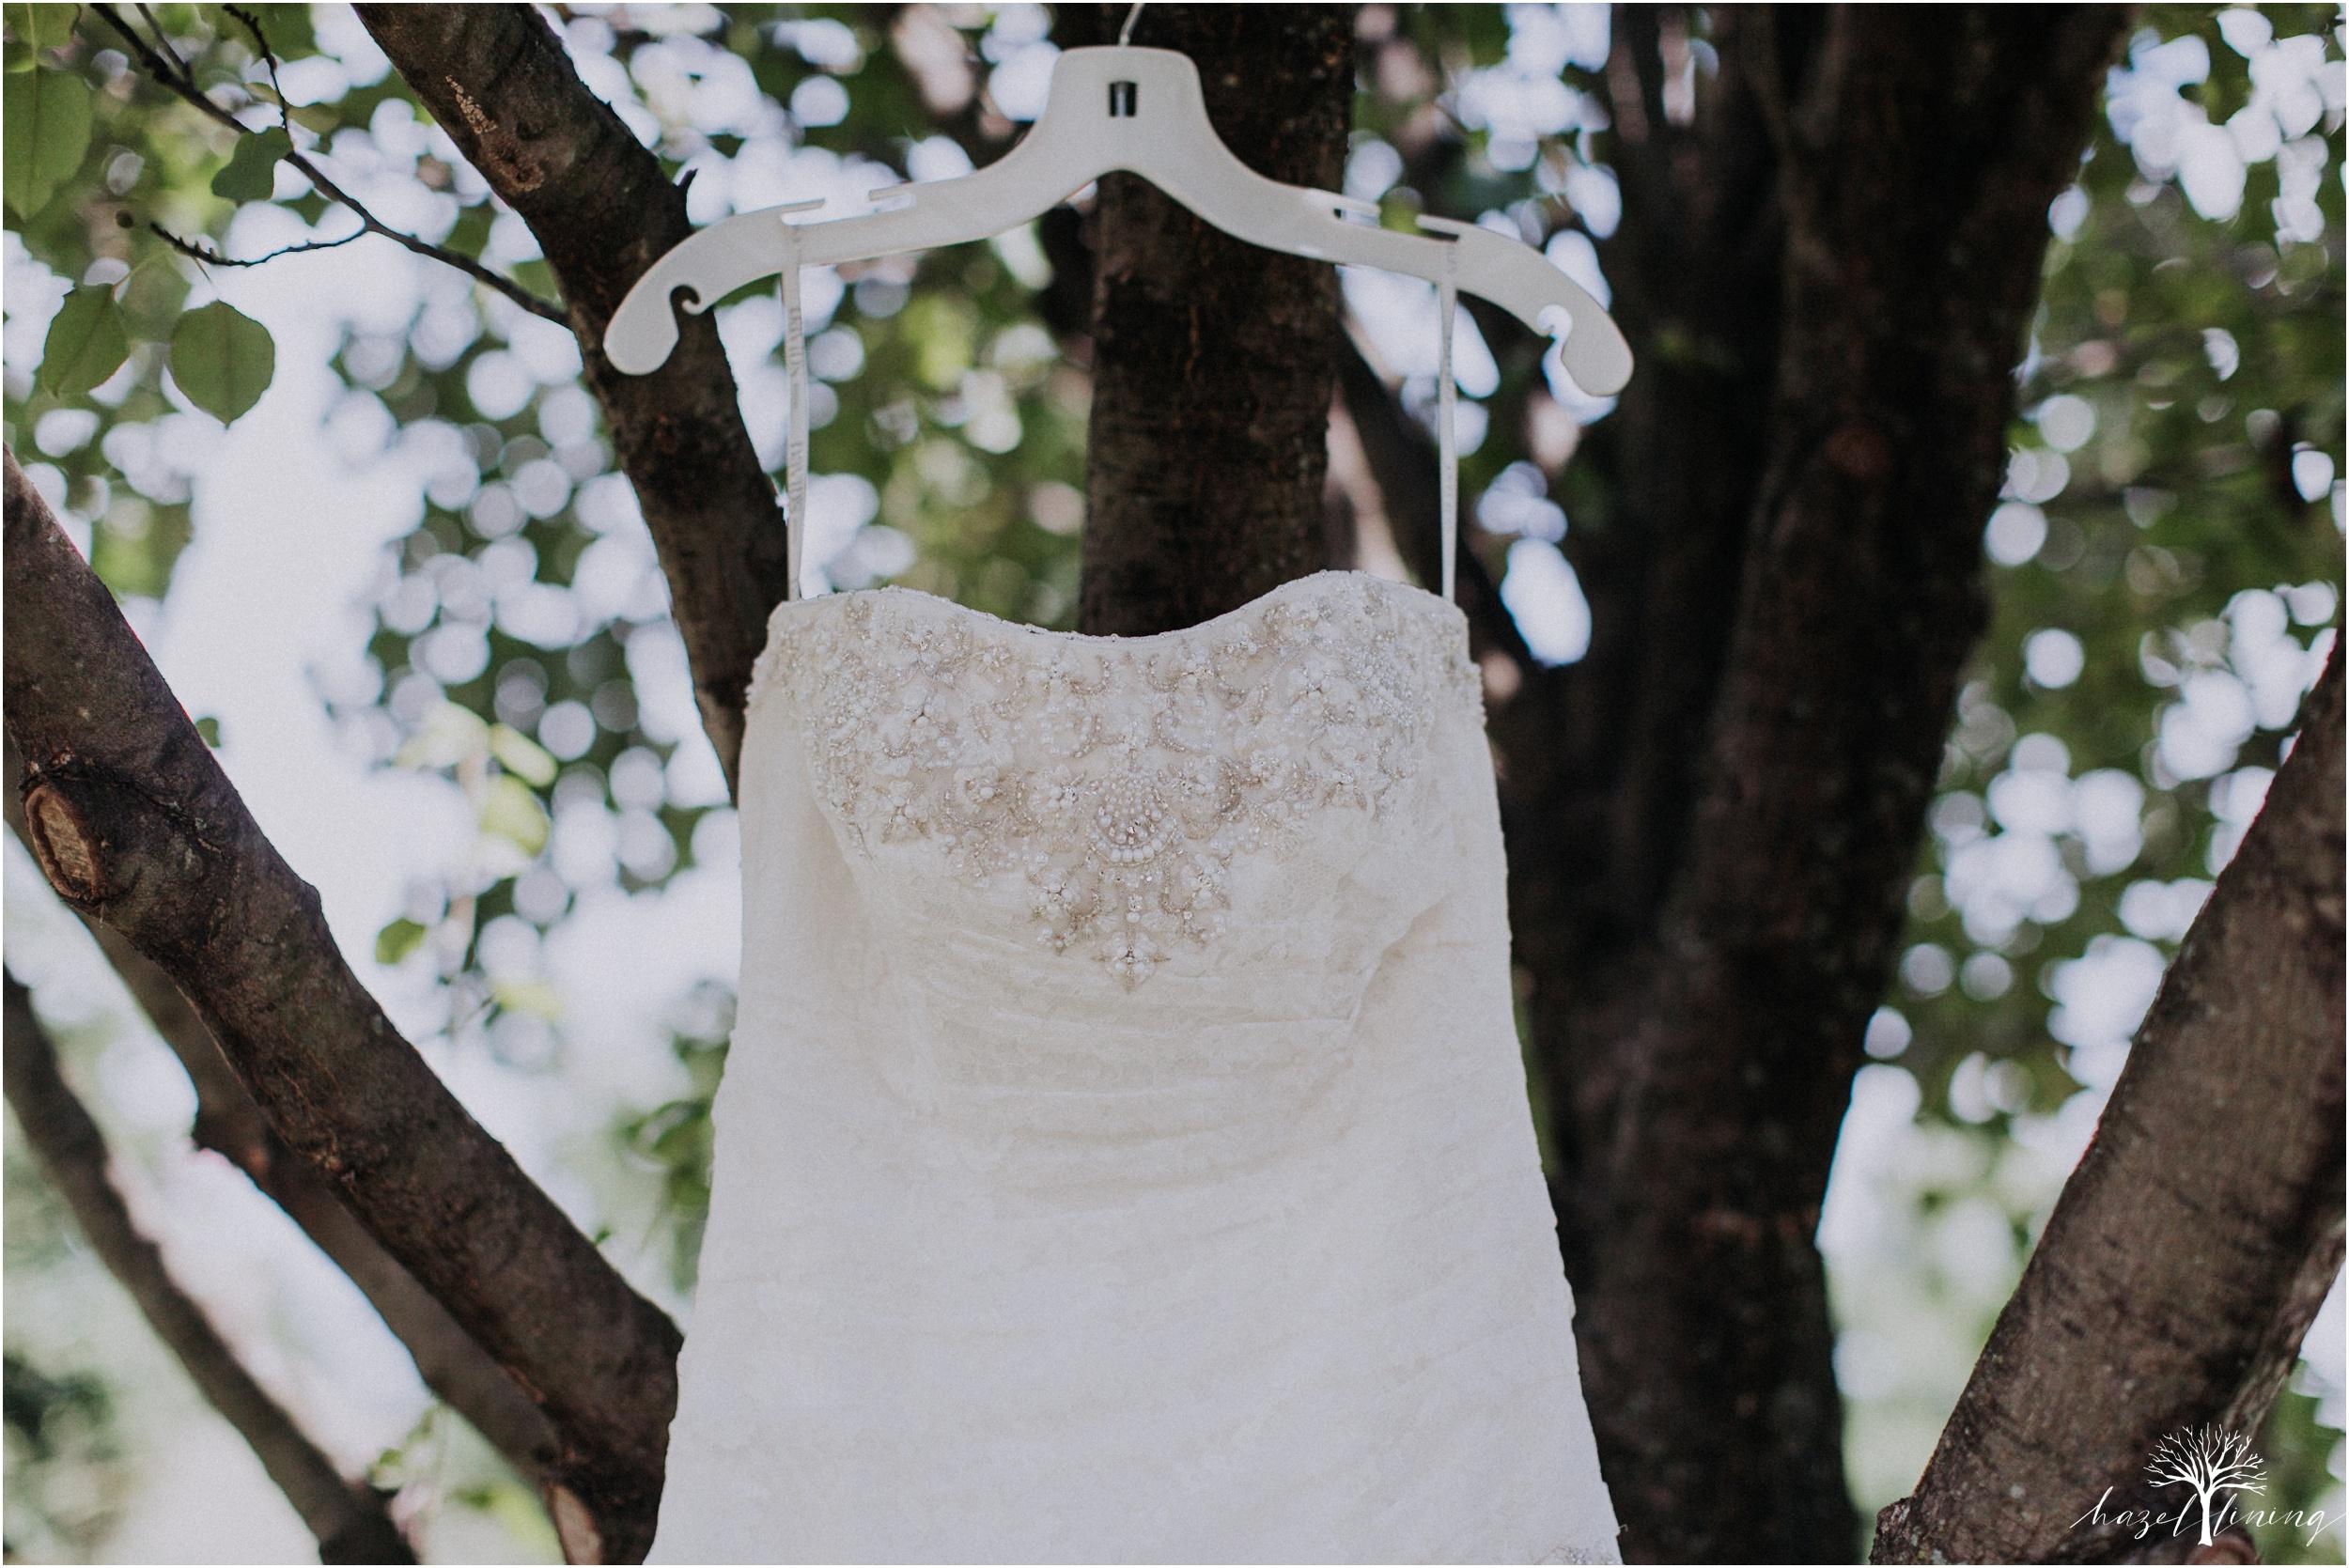 alyssa-james-stiteler-wedding-loft-and-sweet-water-cc-pennsburg-pennsylvania-hazel-lining-travel-wedding-elopement-photography_0014.jpg